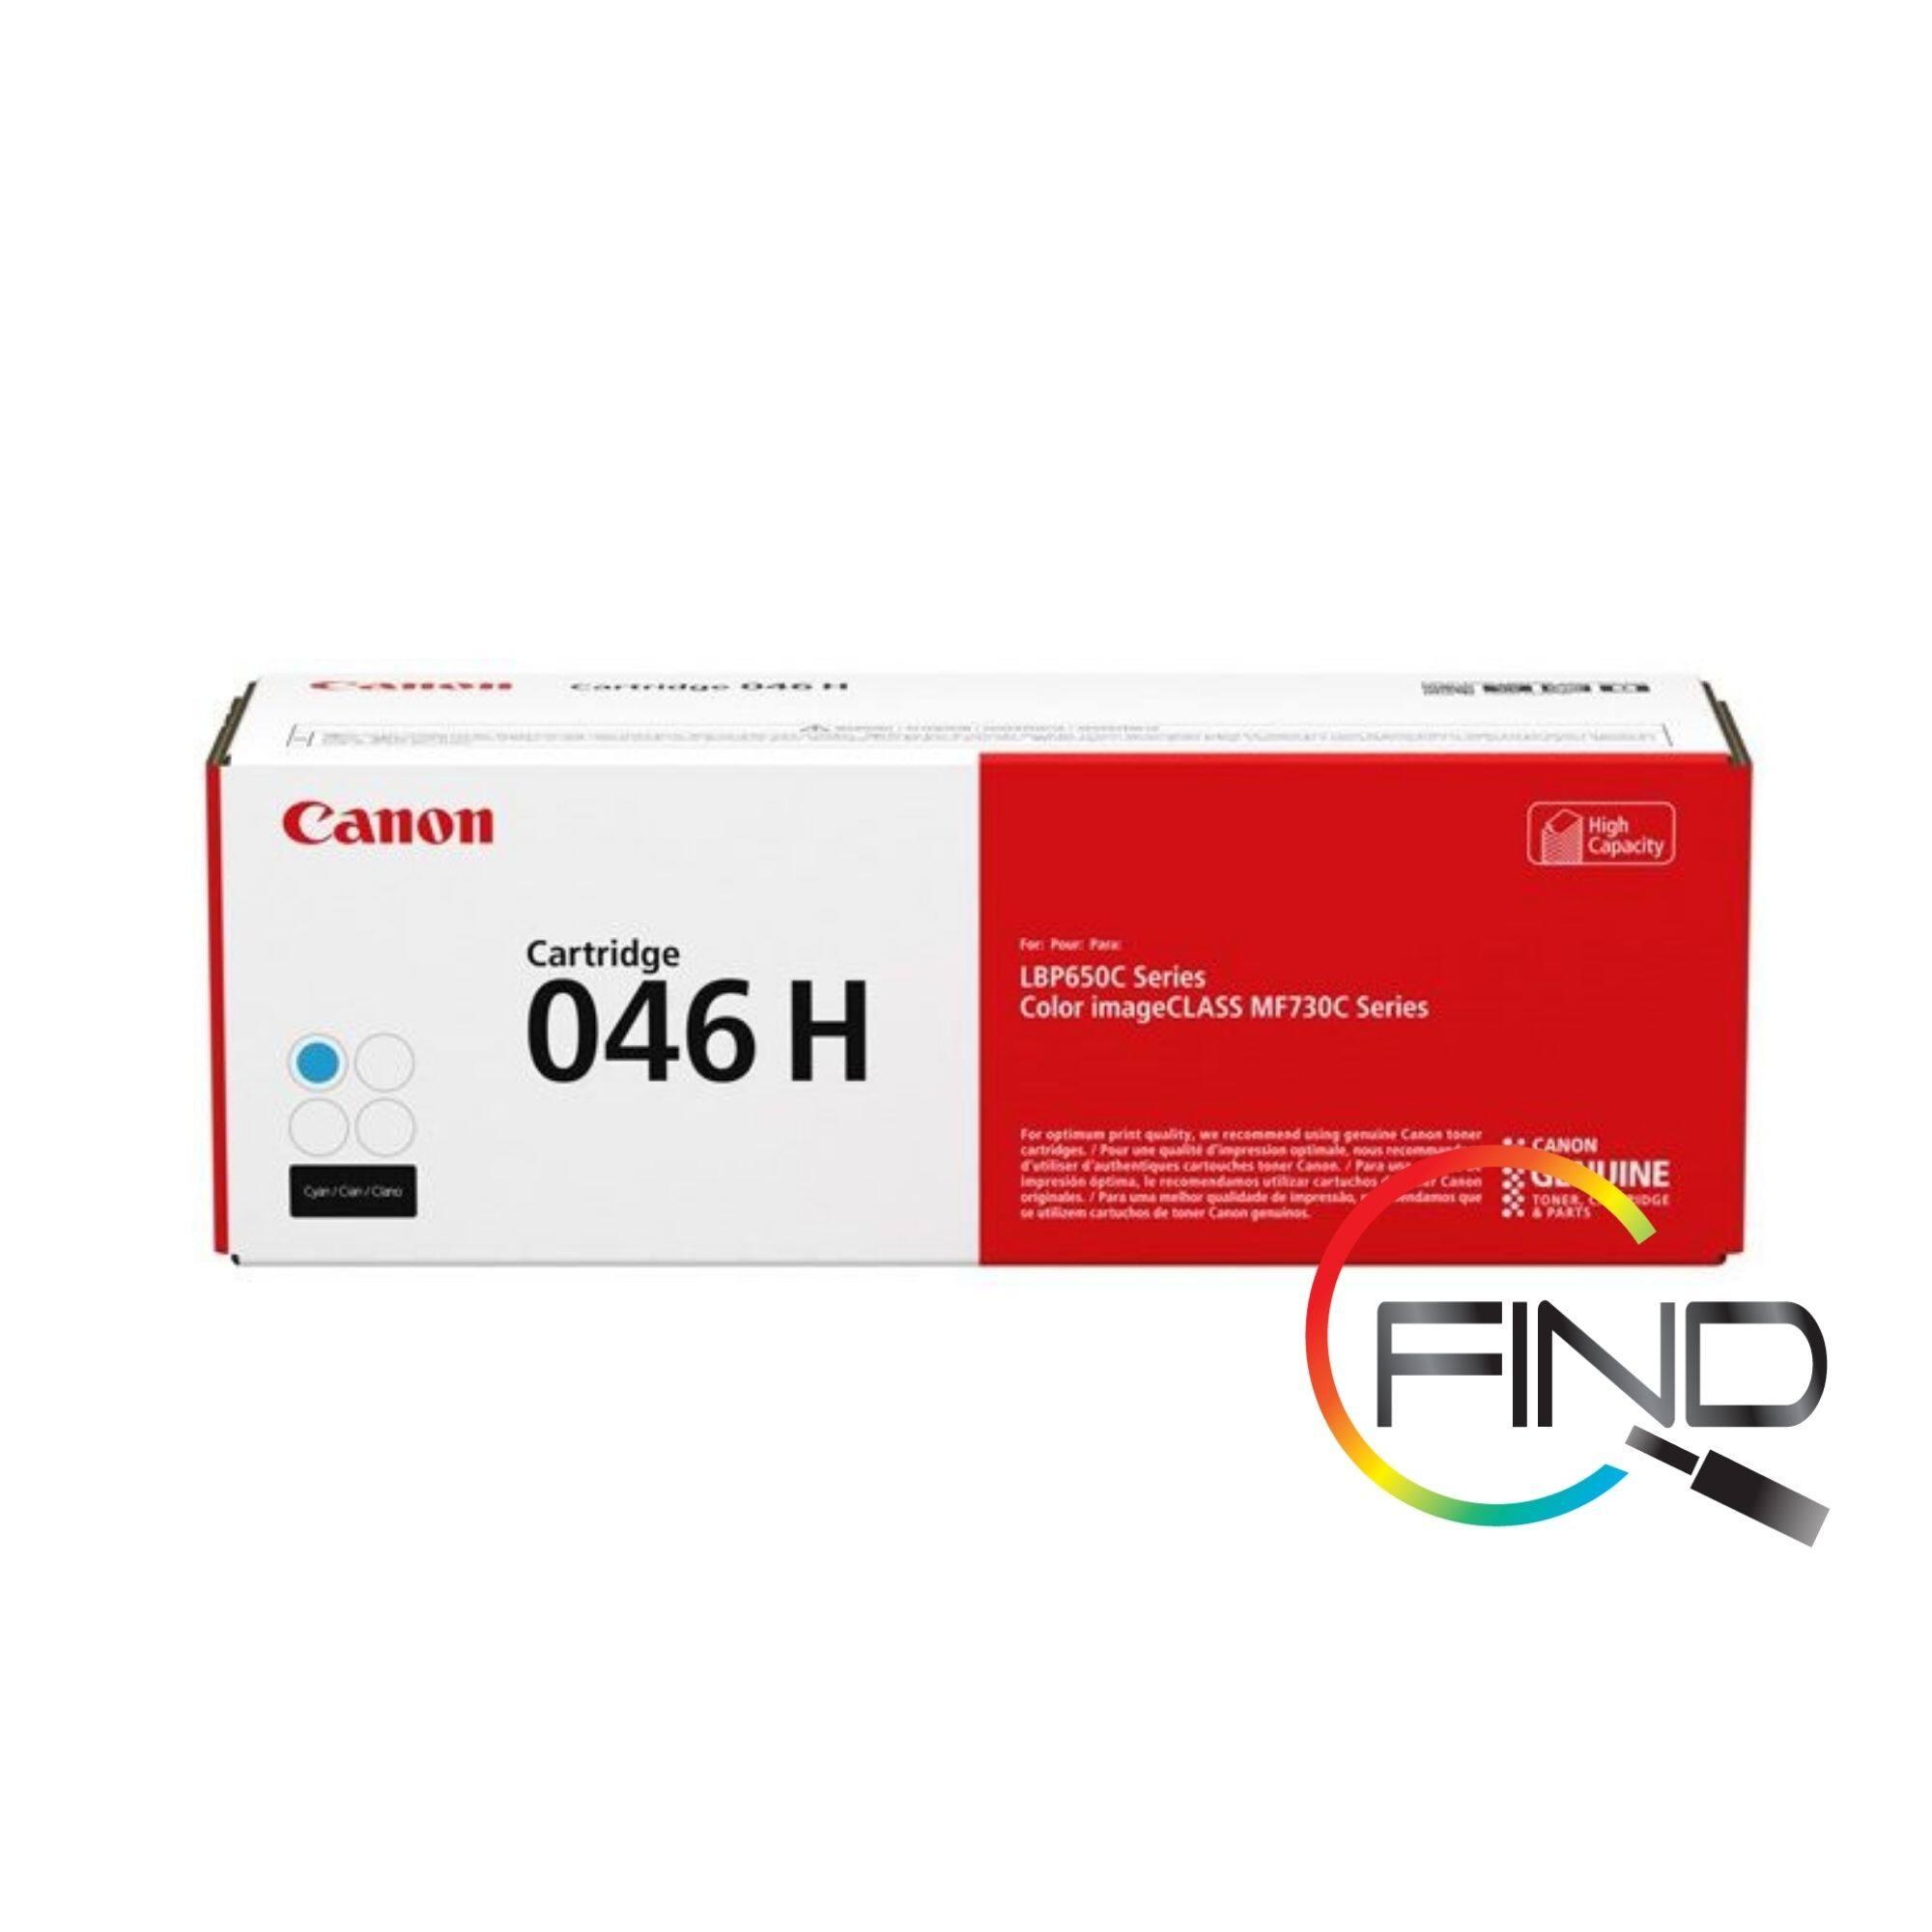 Canon Cart 046H Cyan Toner for LBP654Cx/MF735Cx Printer